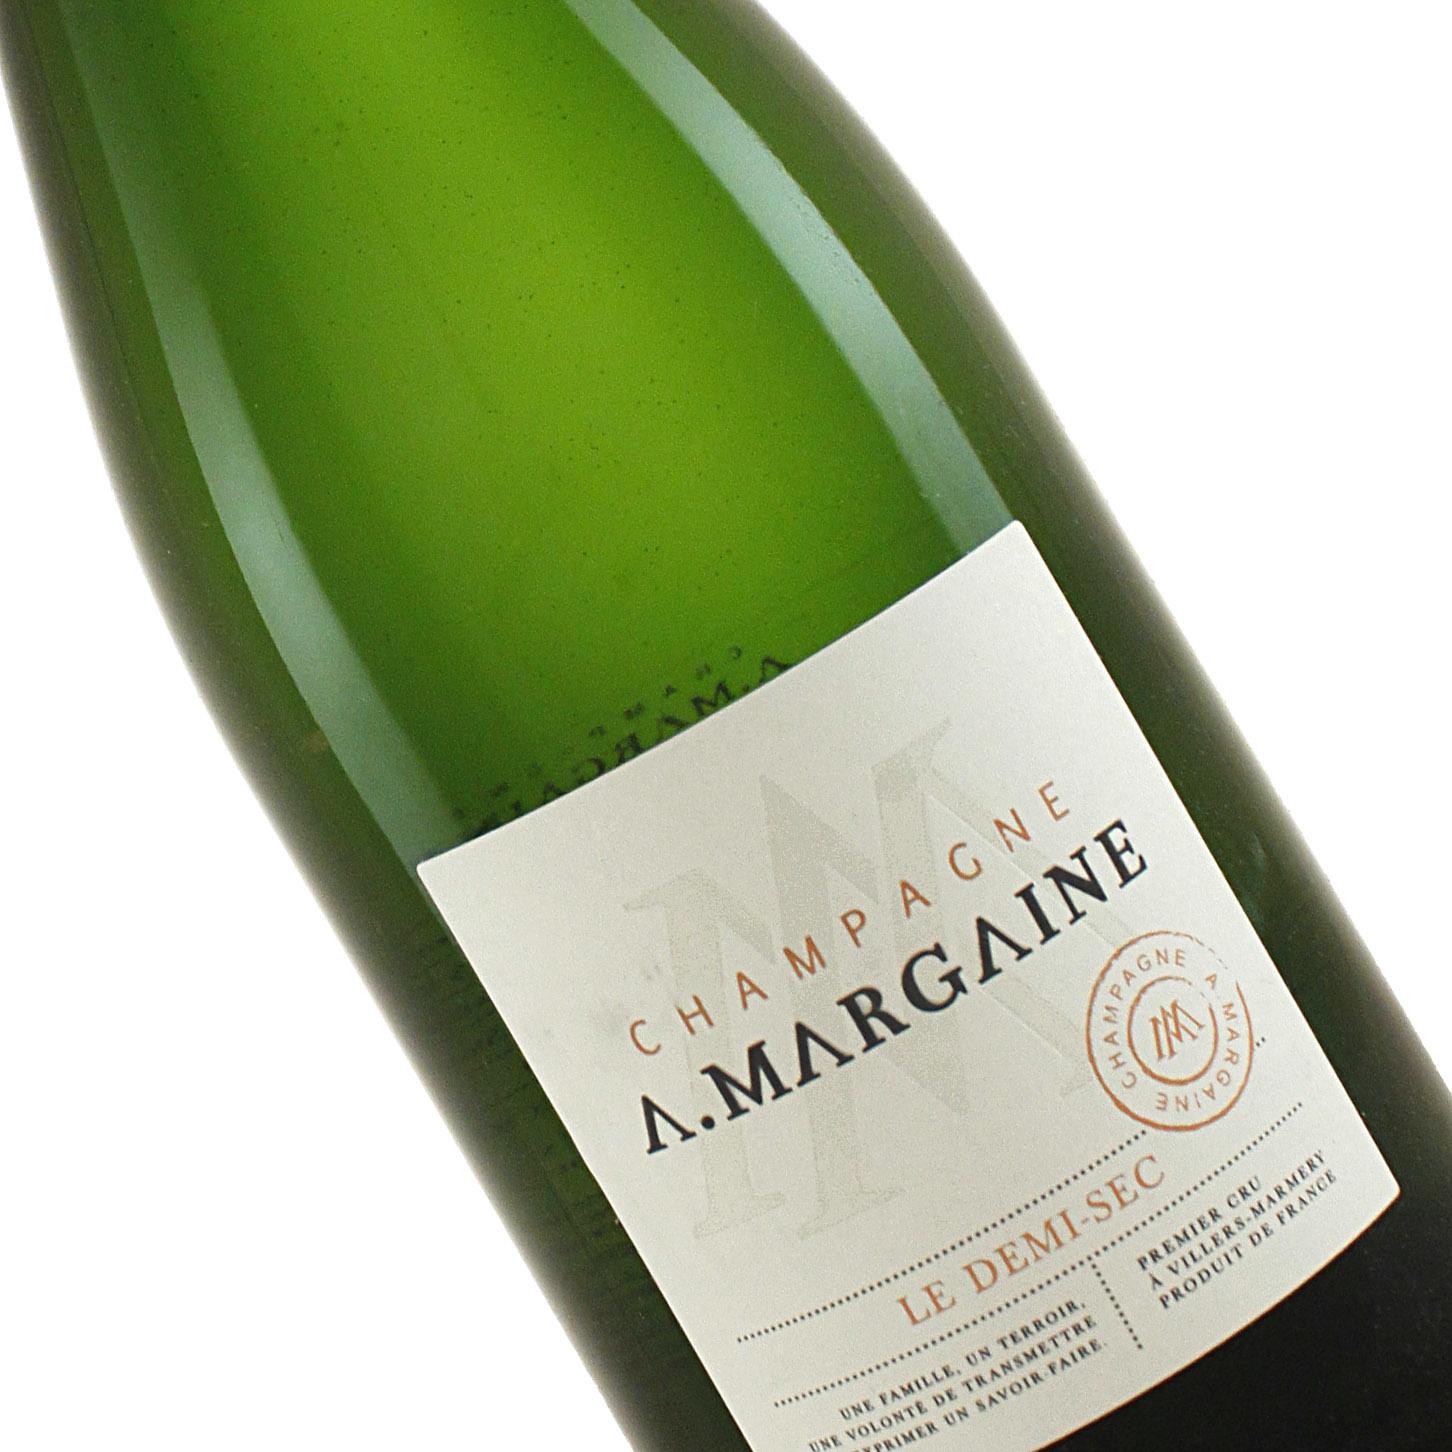 A. Margaine N.V. Champagne Le Demi-Sec